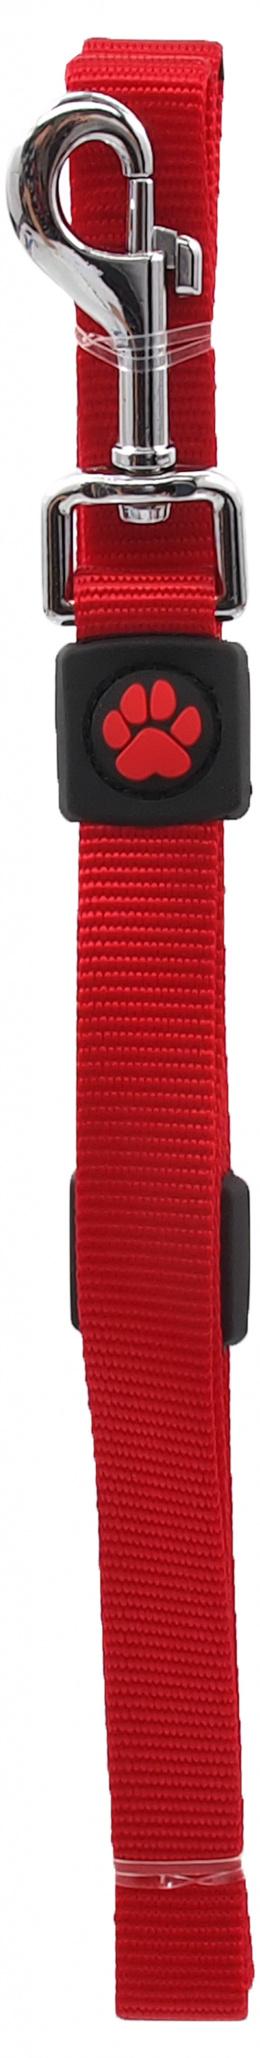 Vodítko Active Dog Premium M červené 2x120cm